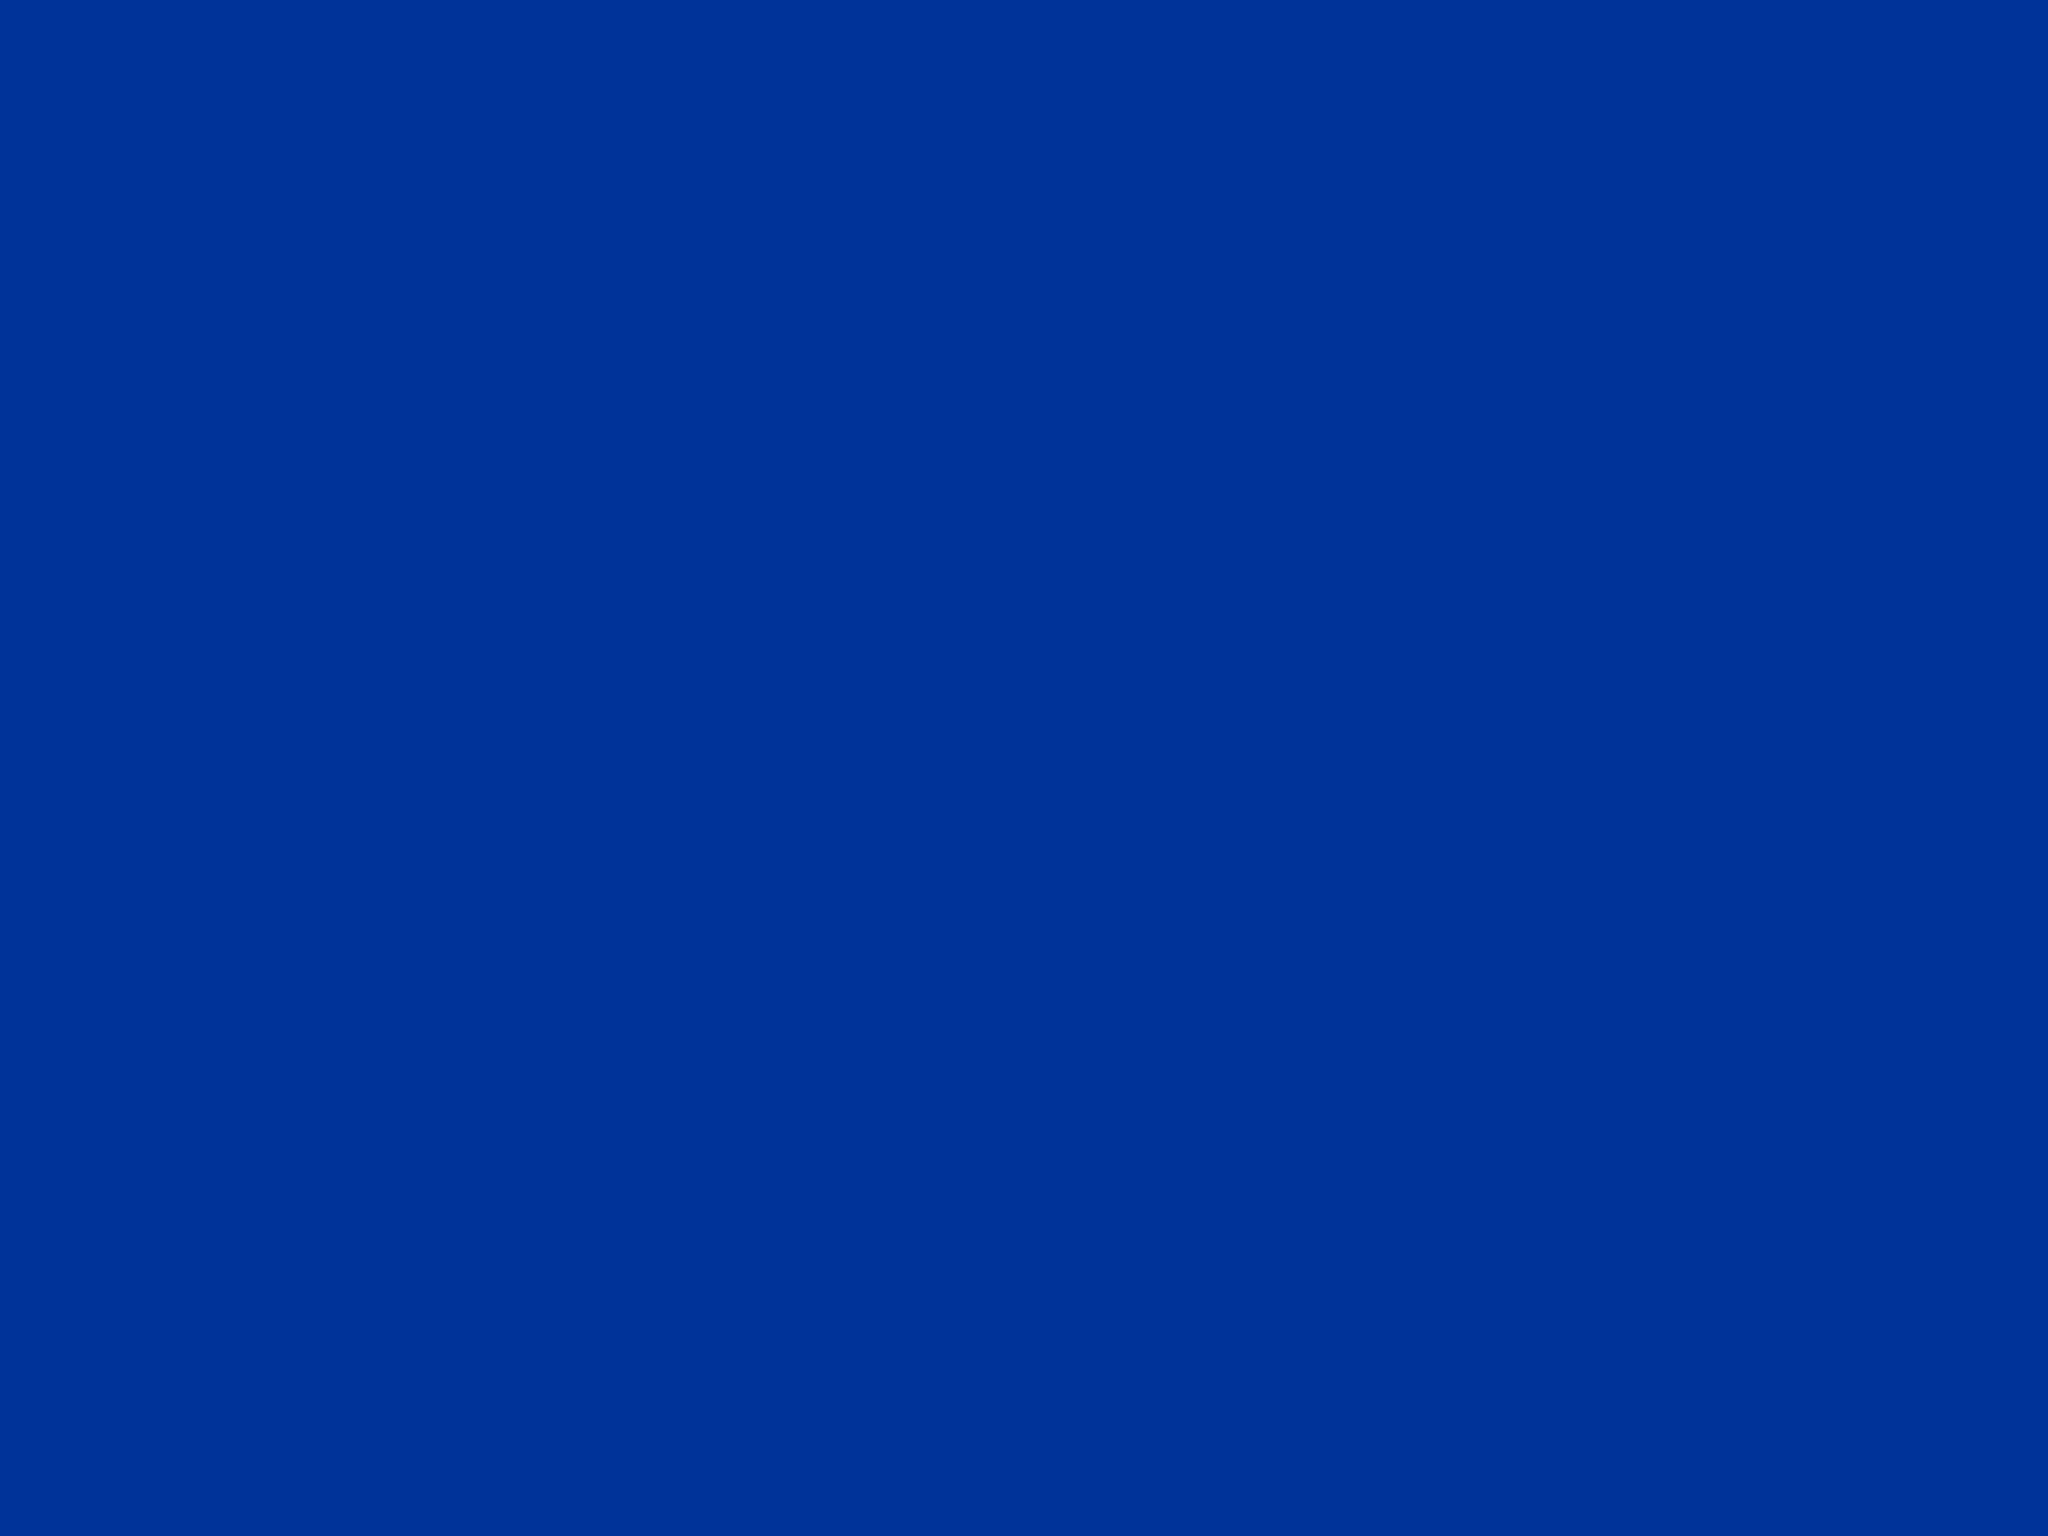 2048x1536 Dark Powder Blue Solid Color Background